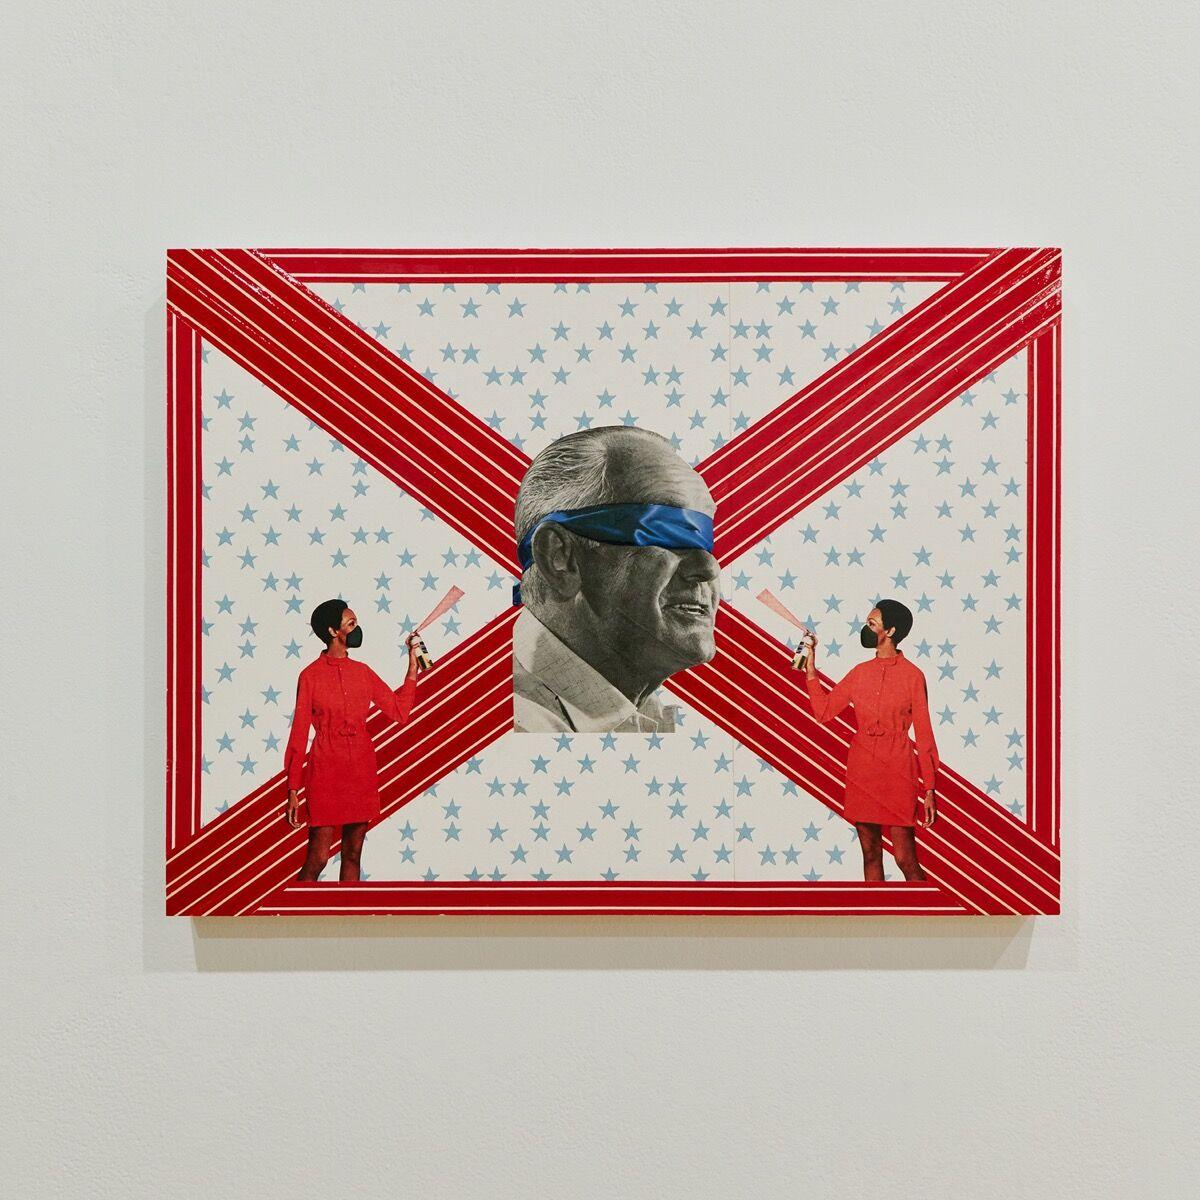 Genevieve Gaignard, Disinfect Our Politics, 2020. © Genevieve Gaignard. Courtesy of the artist and Vielmetter Los Angeles.